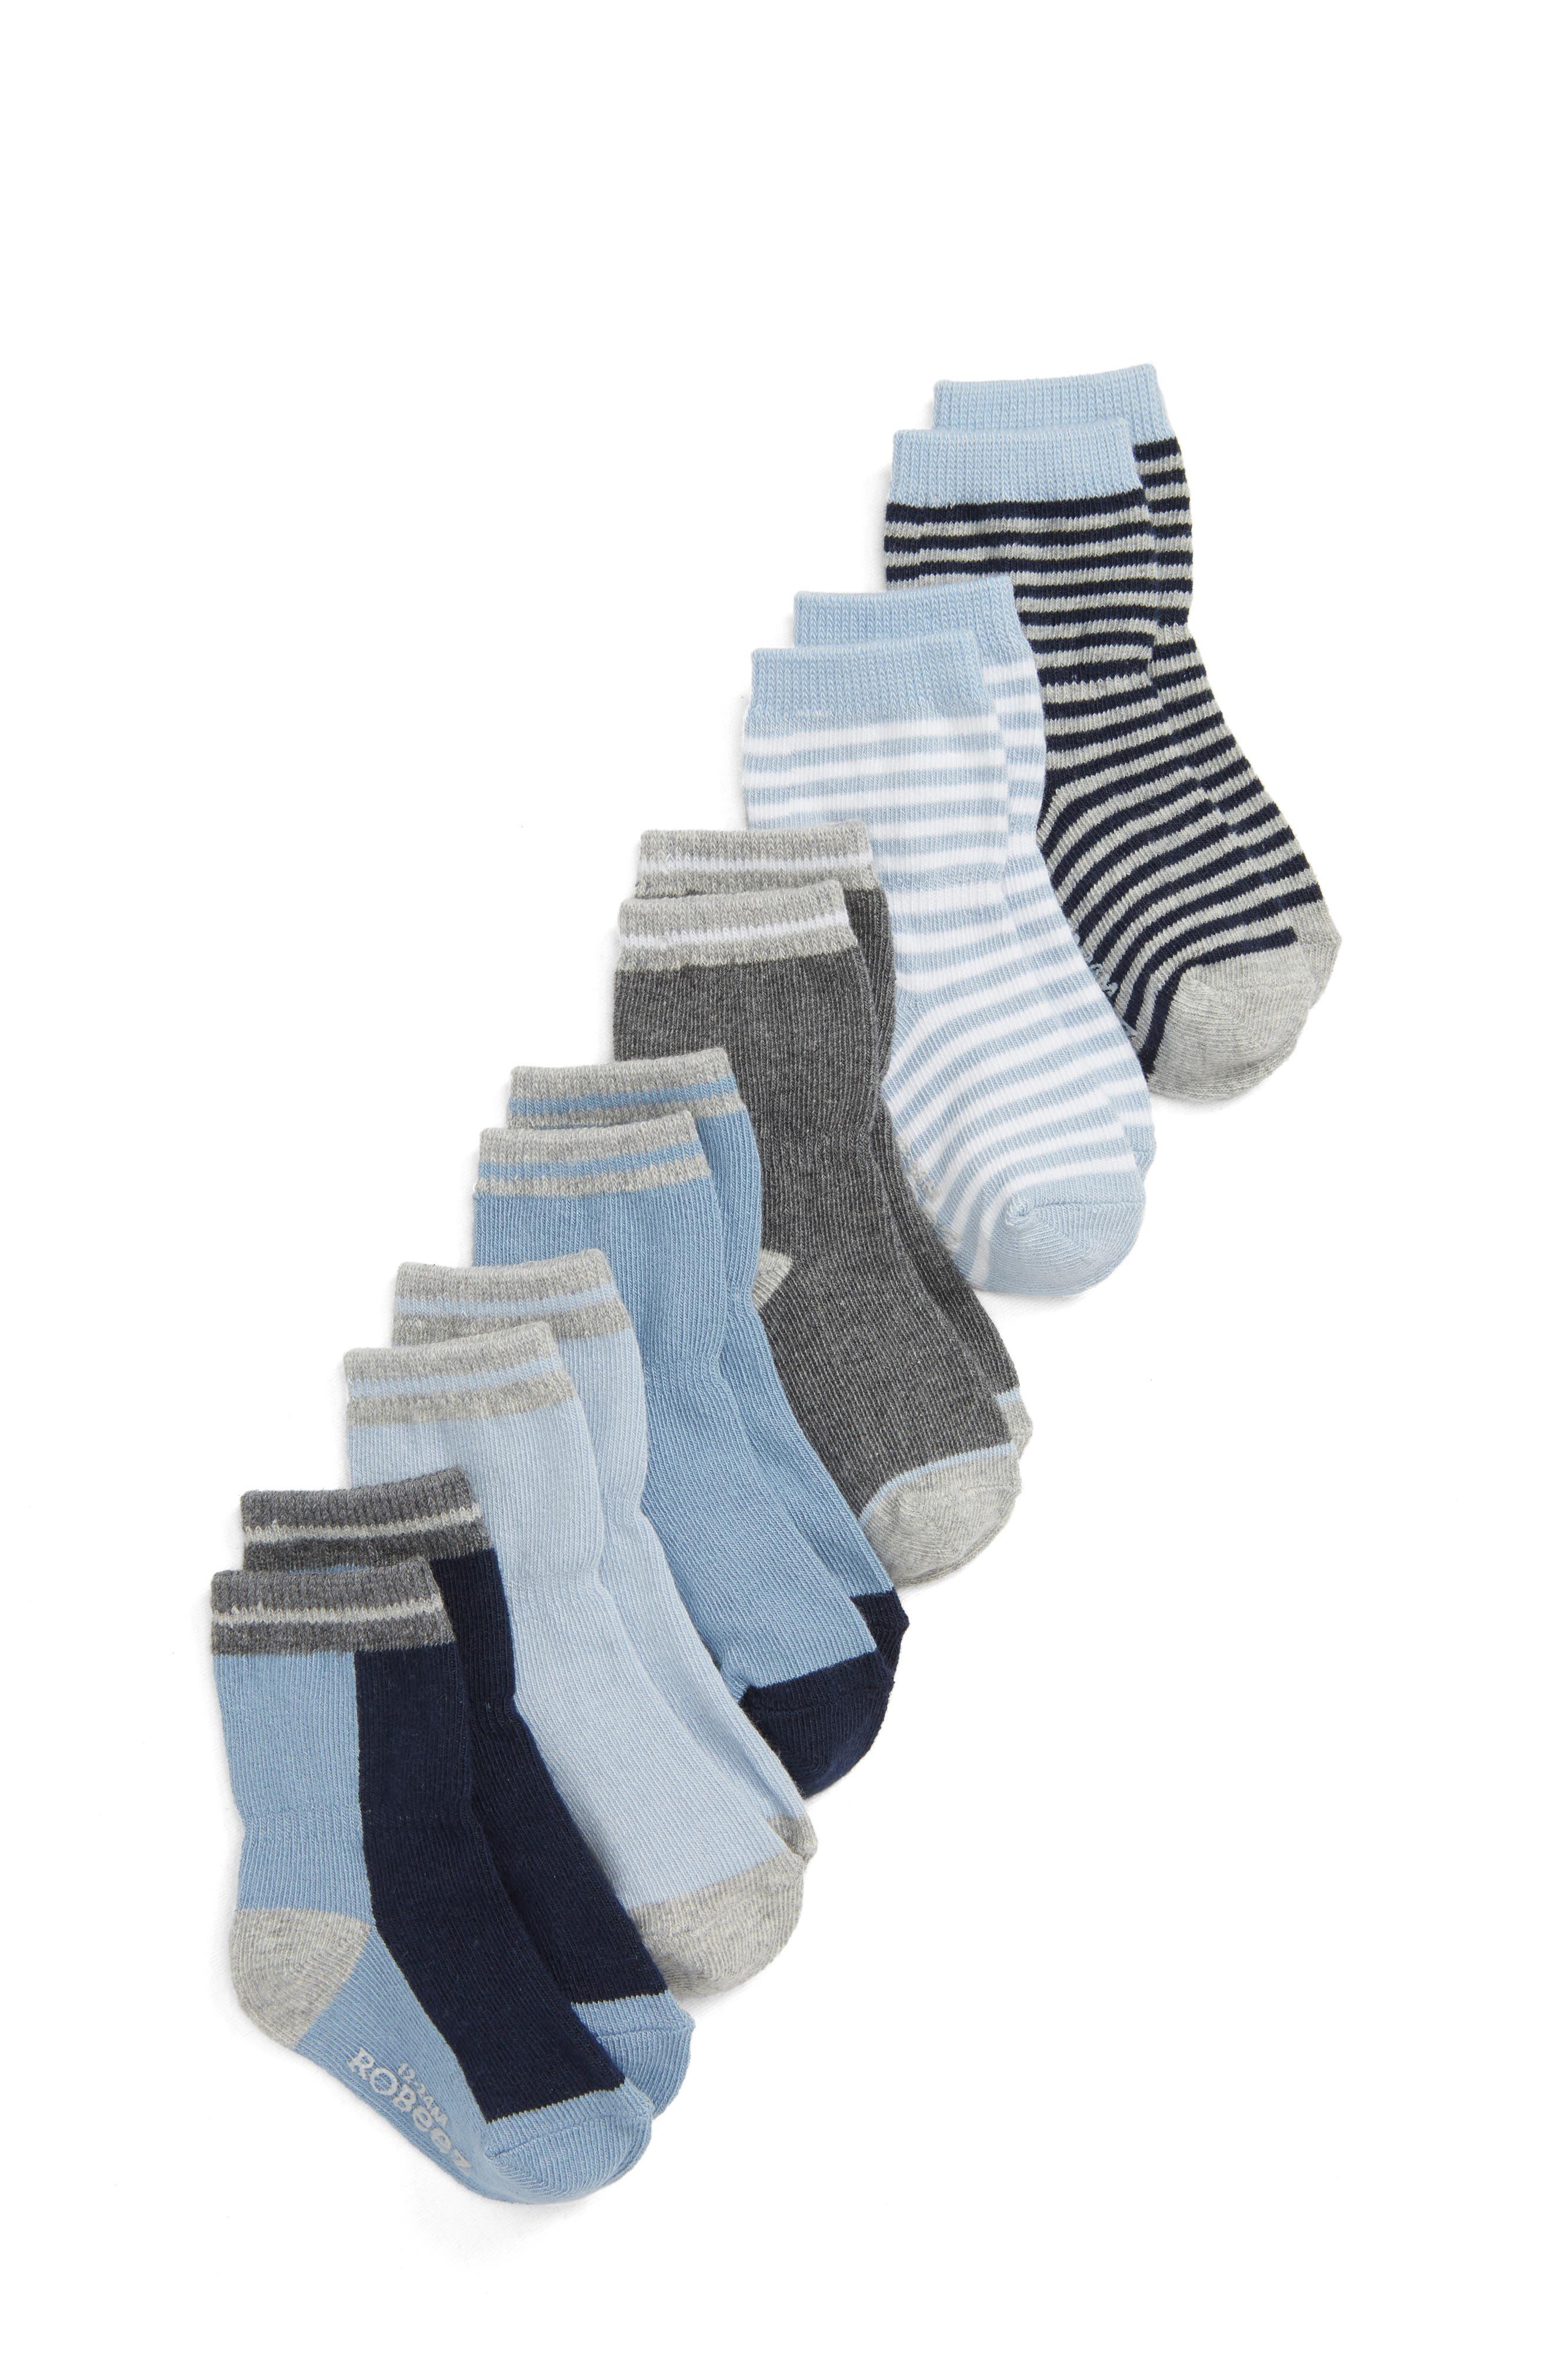 Benjamin Blue 6-Pack Socks,                         Main,                         color, BLUE